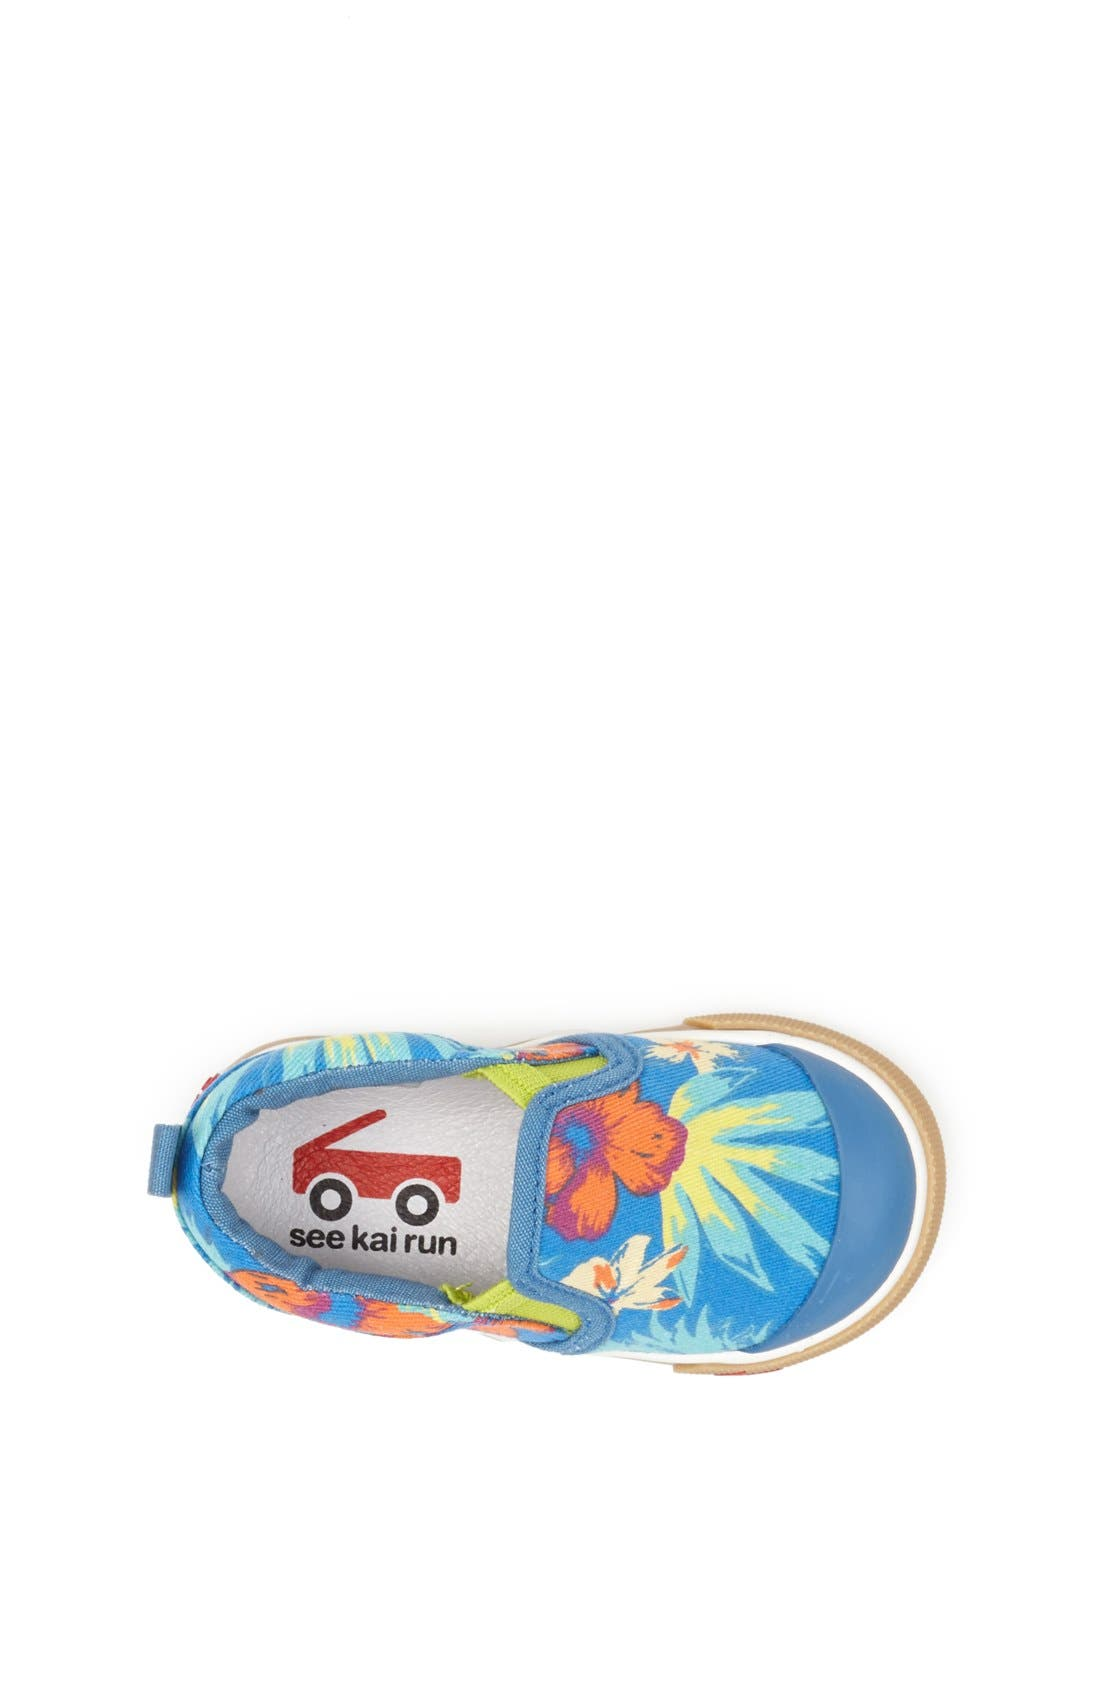 Alternate Image 3  - See Kai Run 'Pablo' Sneaker (Baby & Walker)